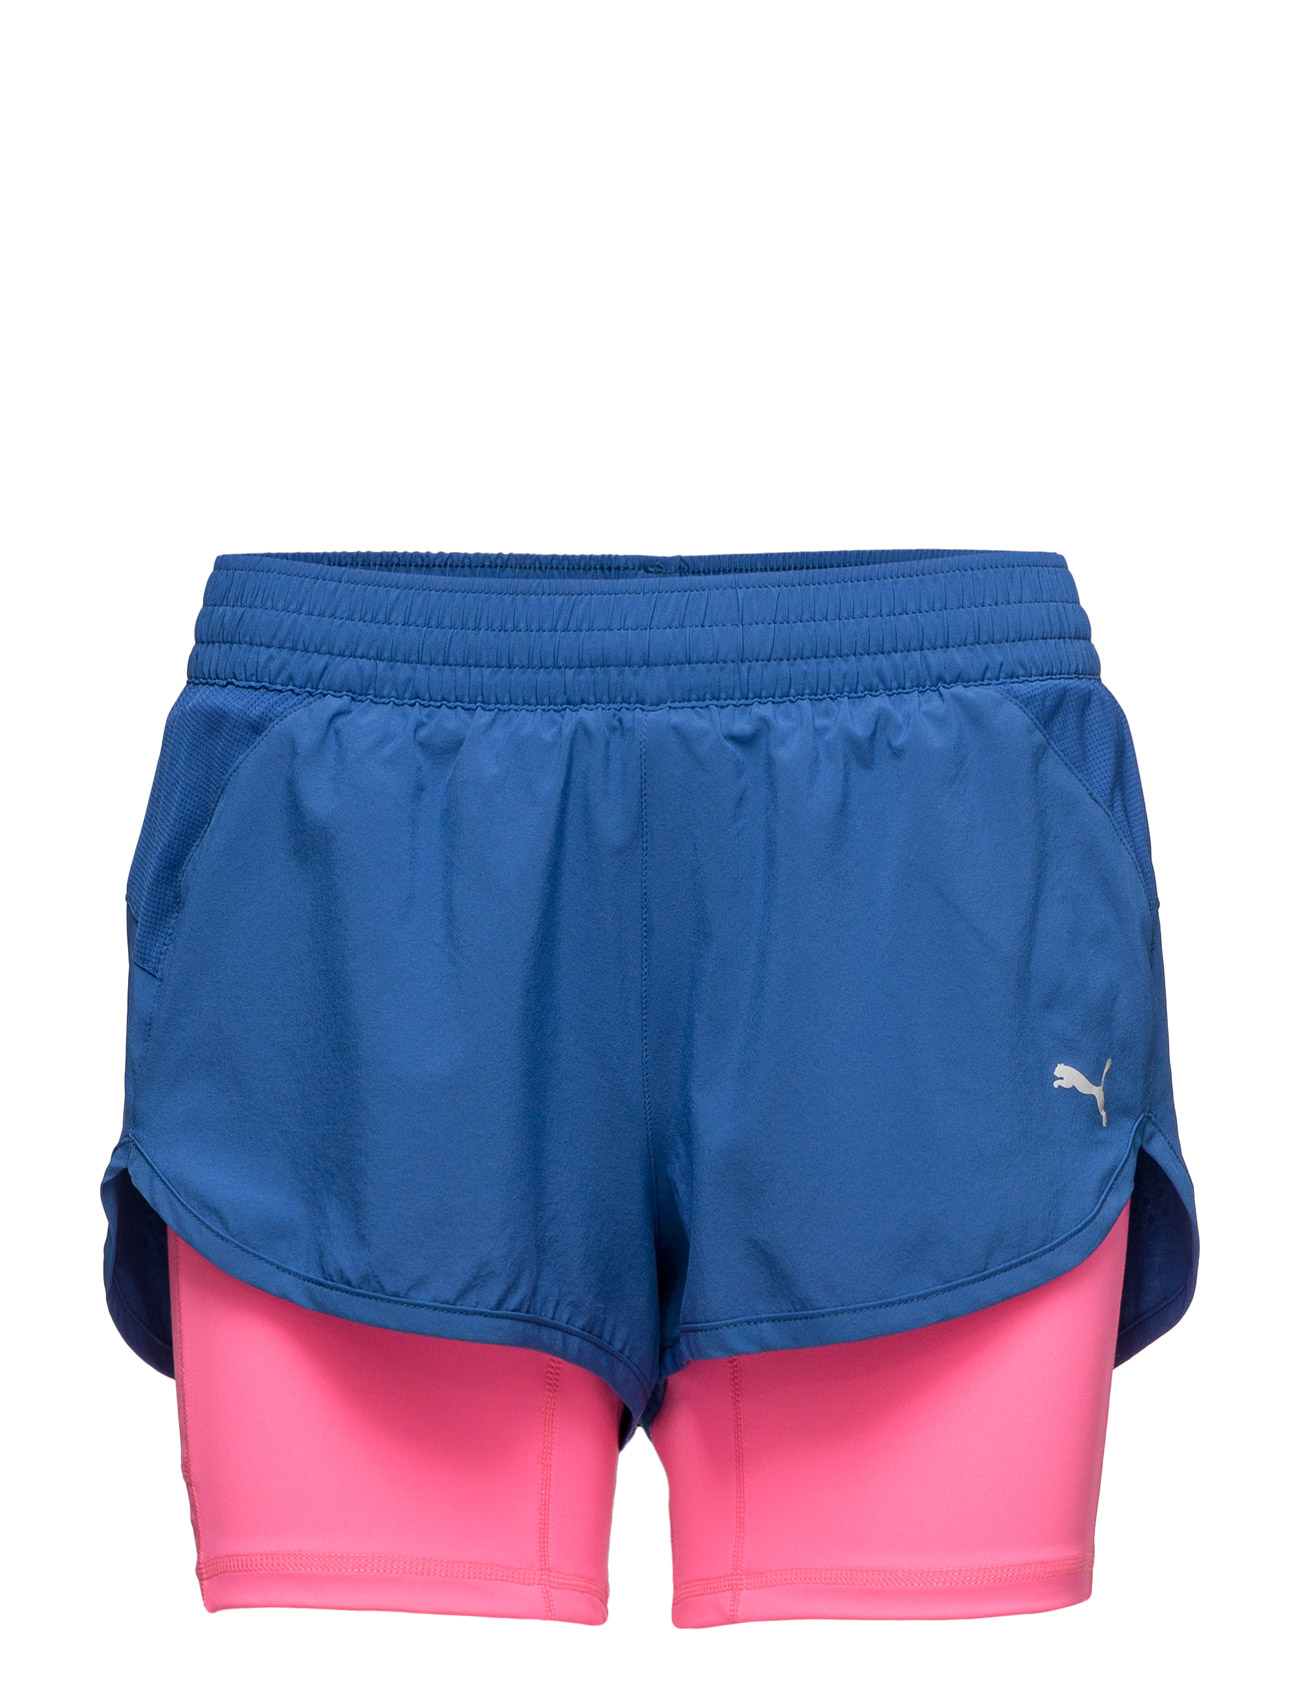 Blast 2in1 3  Short W PUMA SPORT Sportstøj til Kvinder i